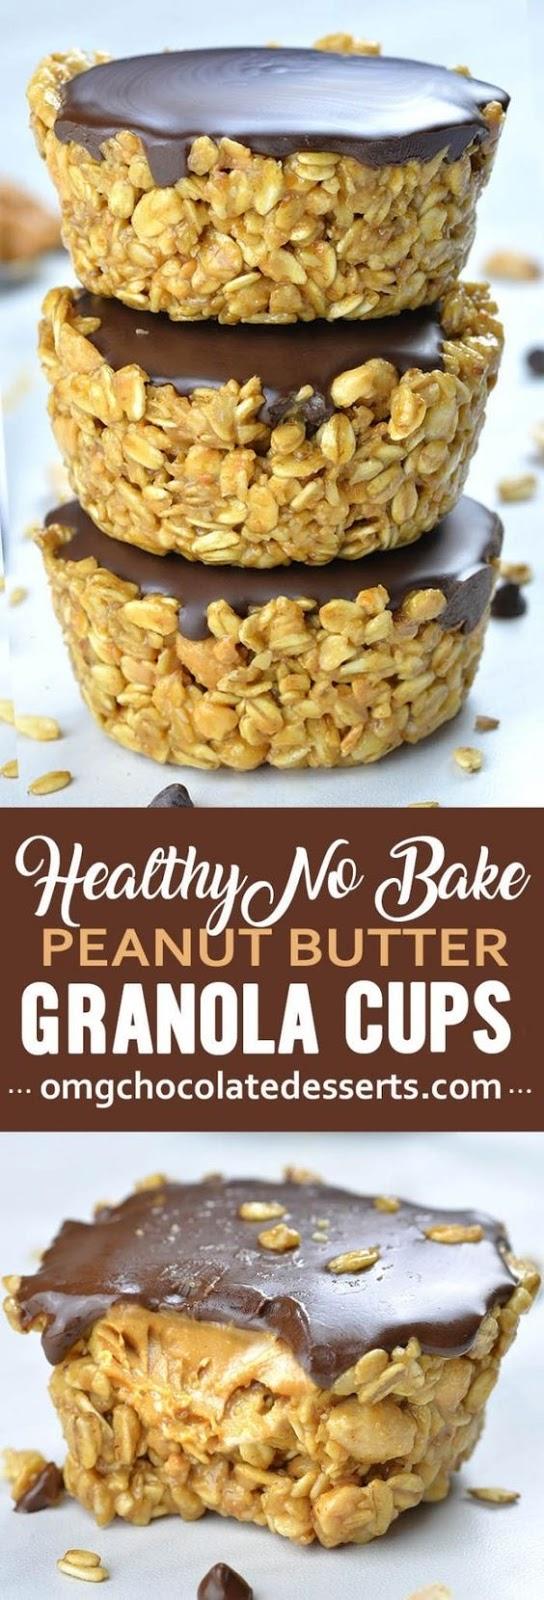 No Bake Peanut Butter Granola Cups